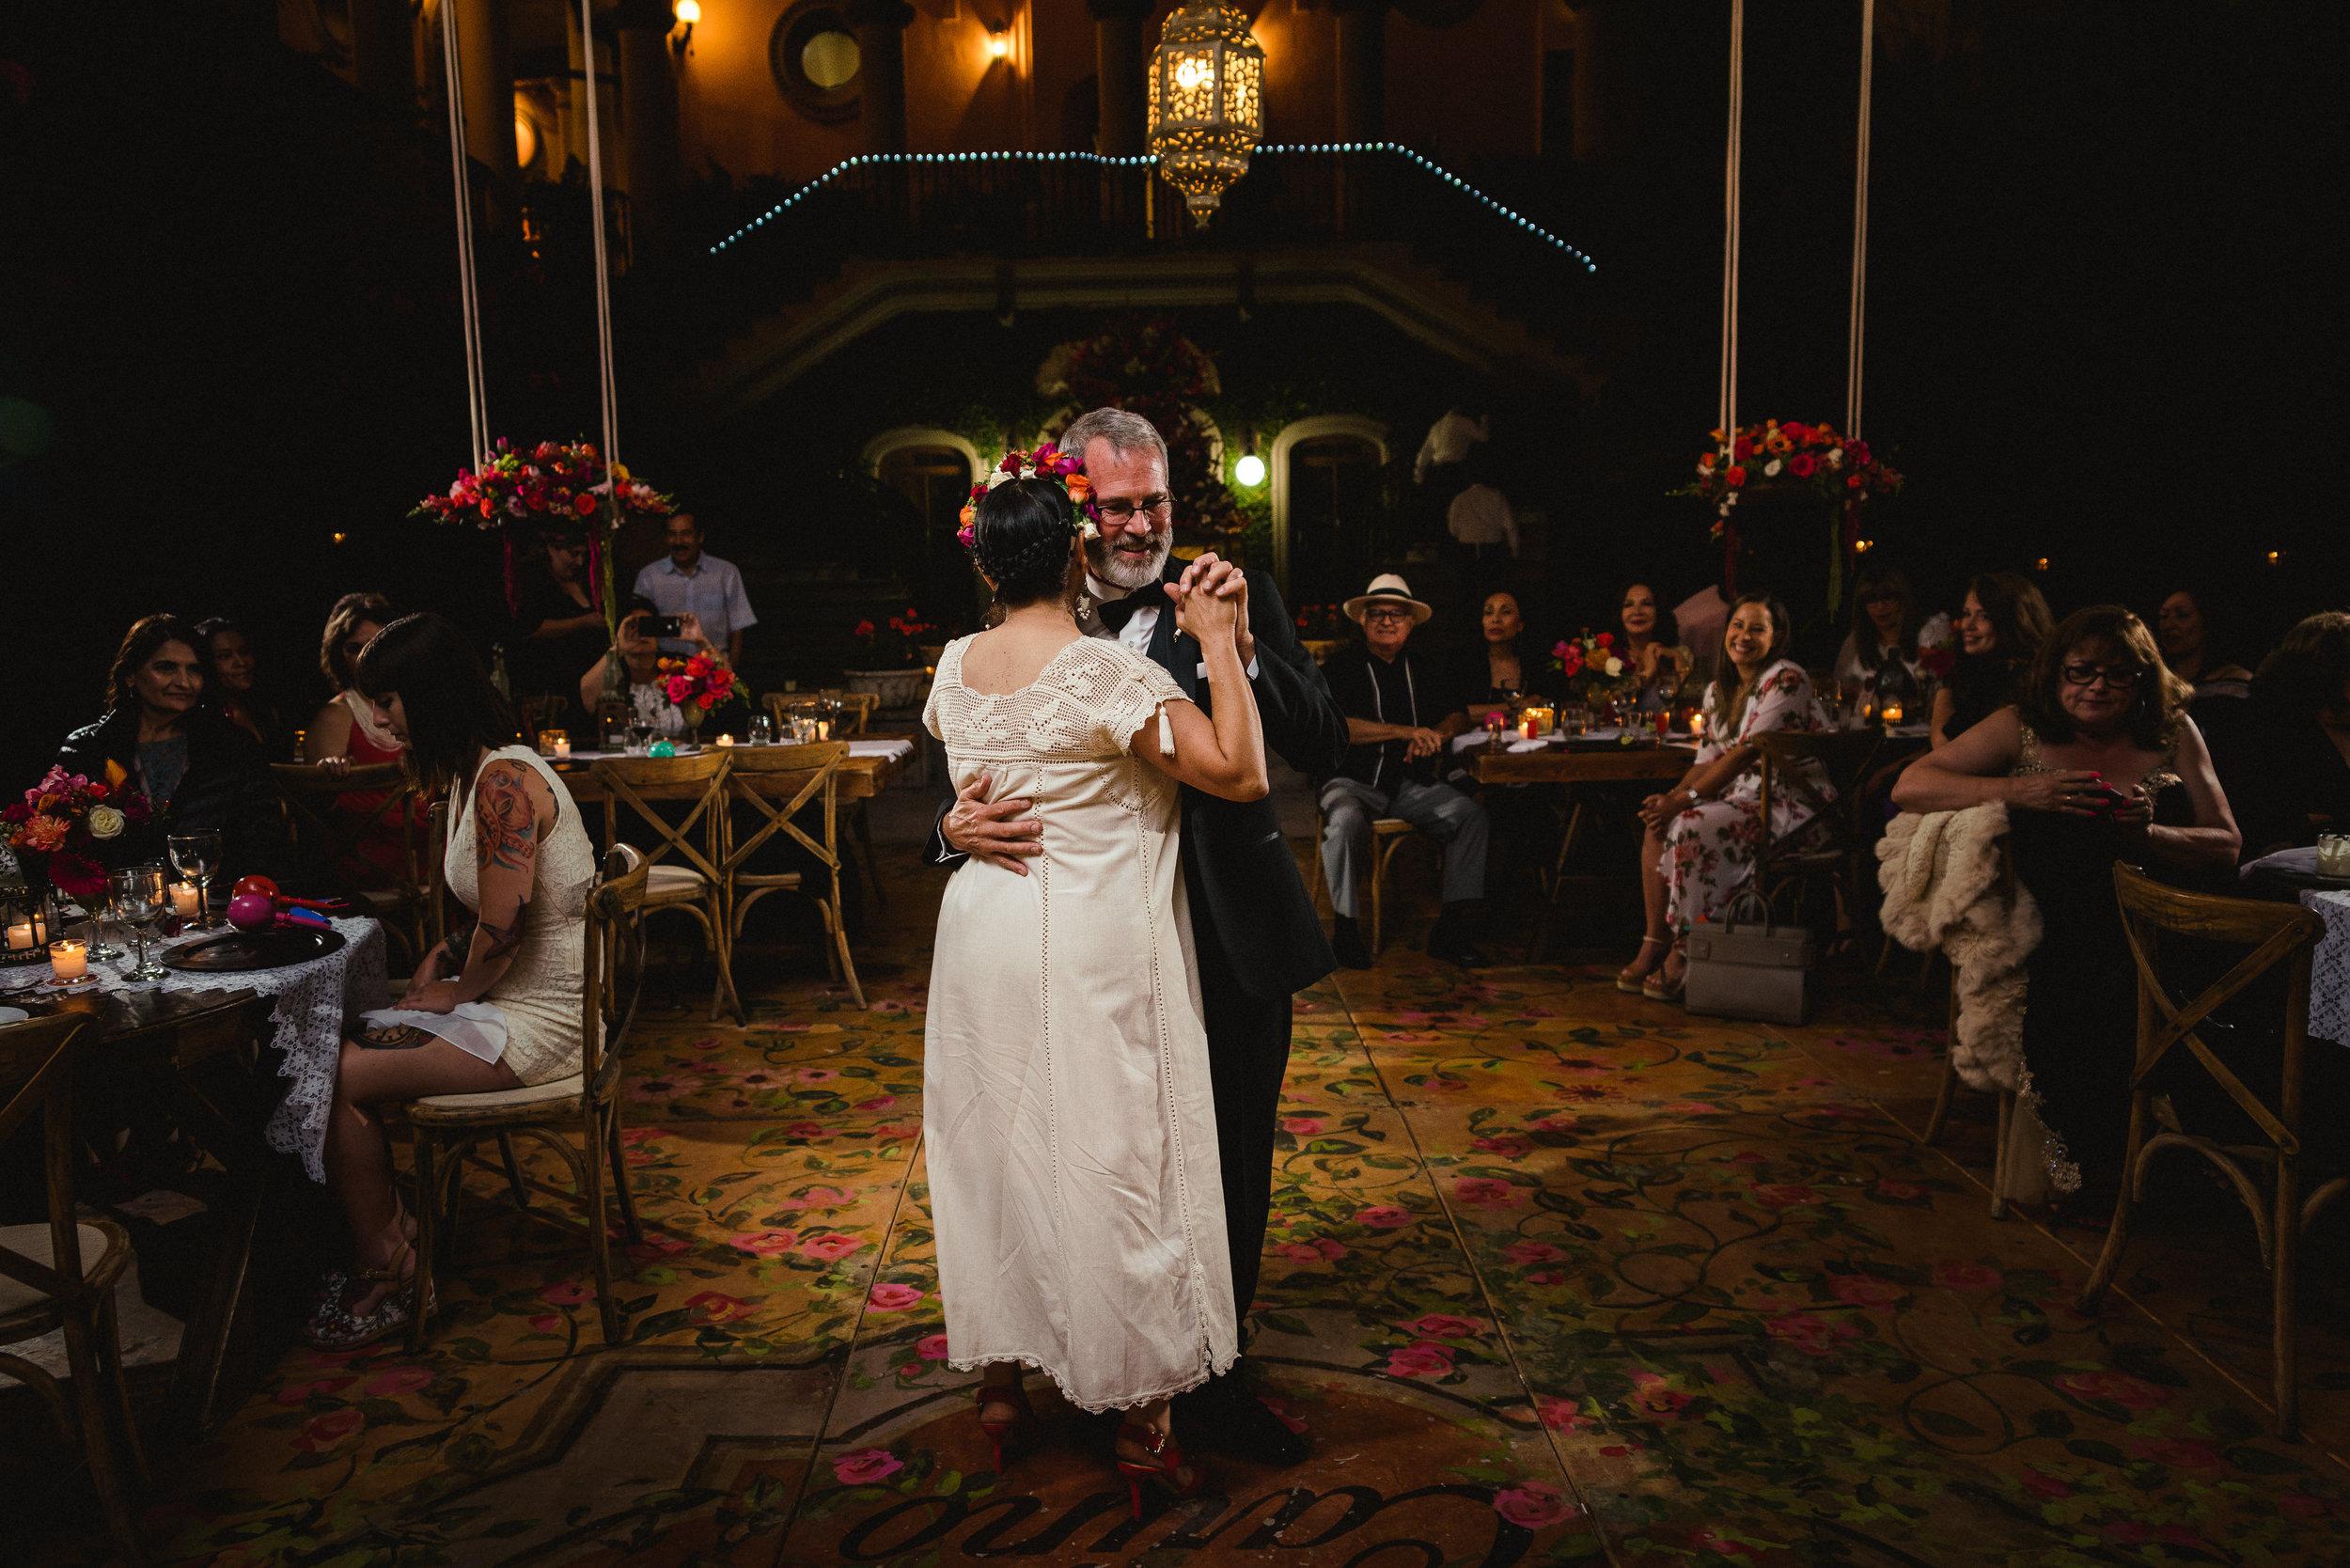 MaurizioSolisBroca-casa-carino-san-miguel-de-allende-wedding-85.jpg